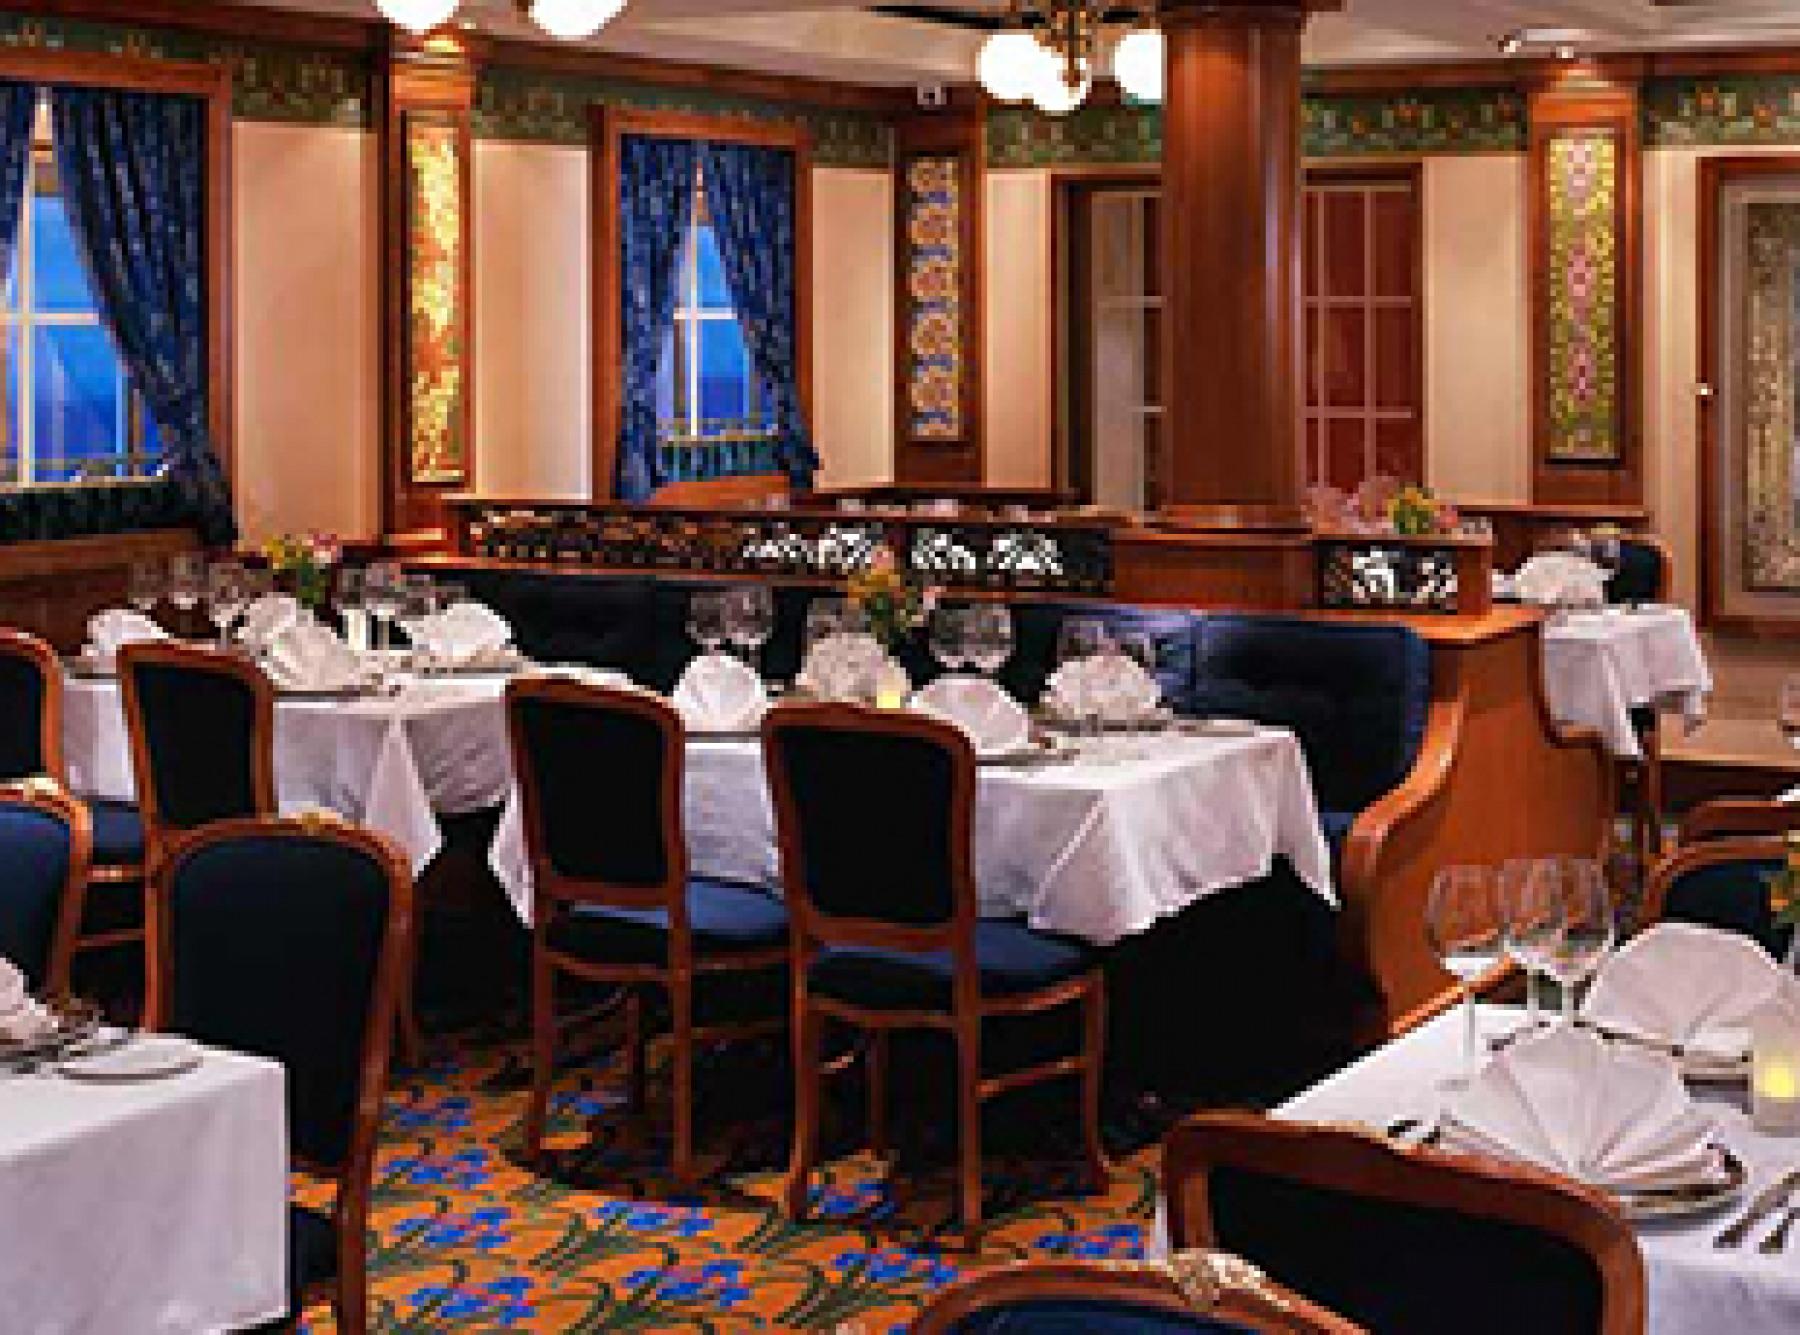 Norwegian Cruise Line Norwegian Dawn Interior Le Bistron French Restaurant.jpg